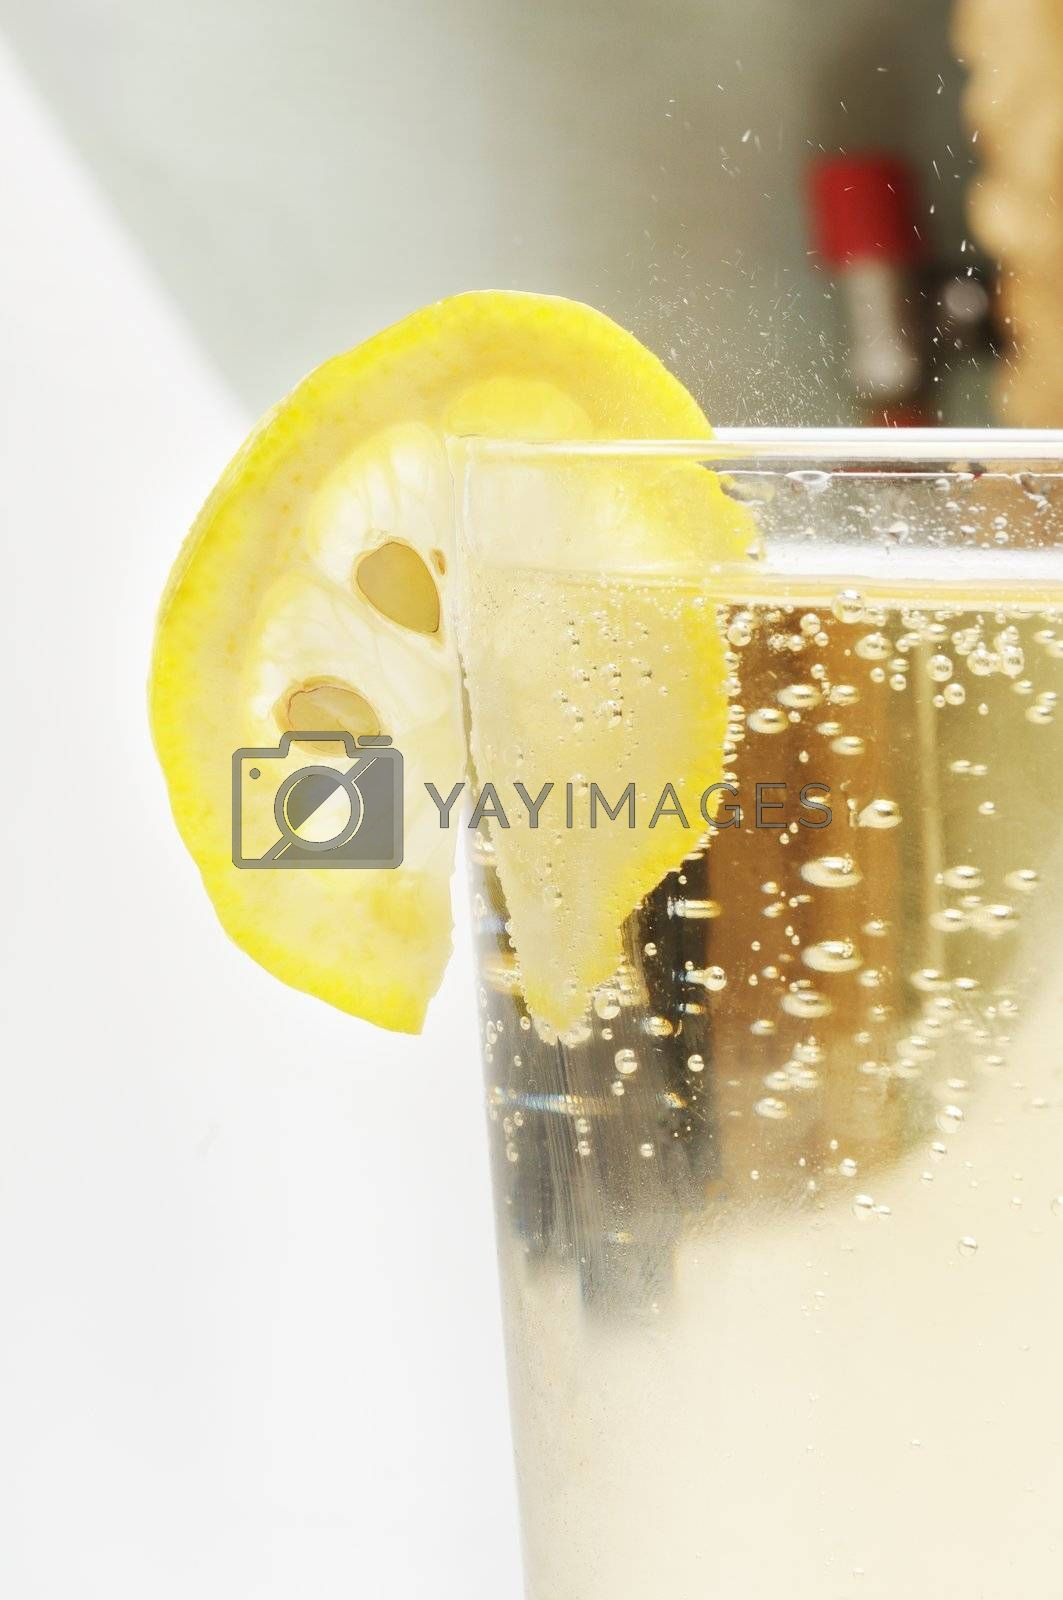 Glass goblet with sparkling lemonade and lemon.